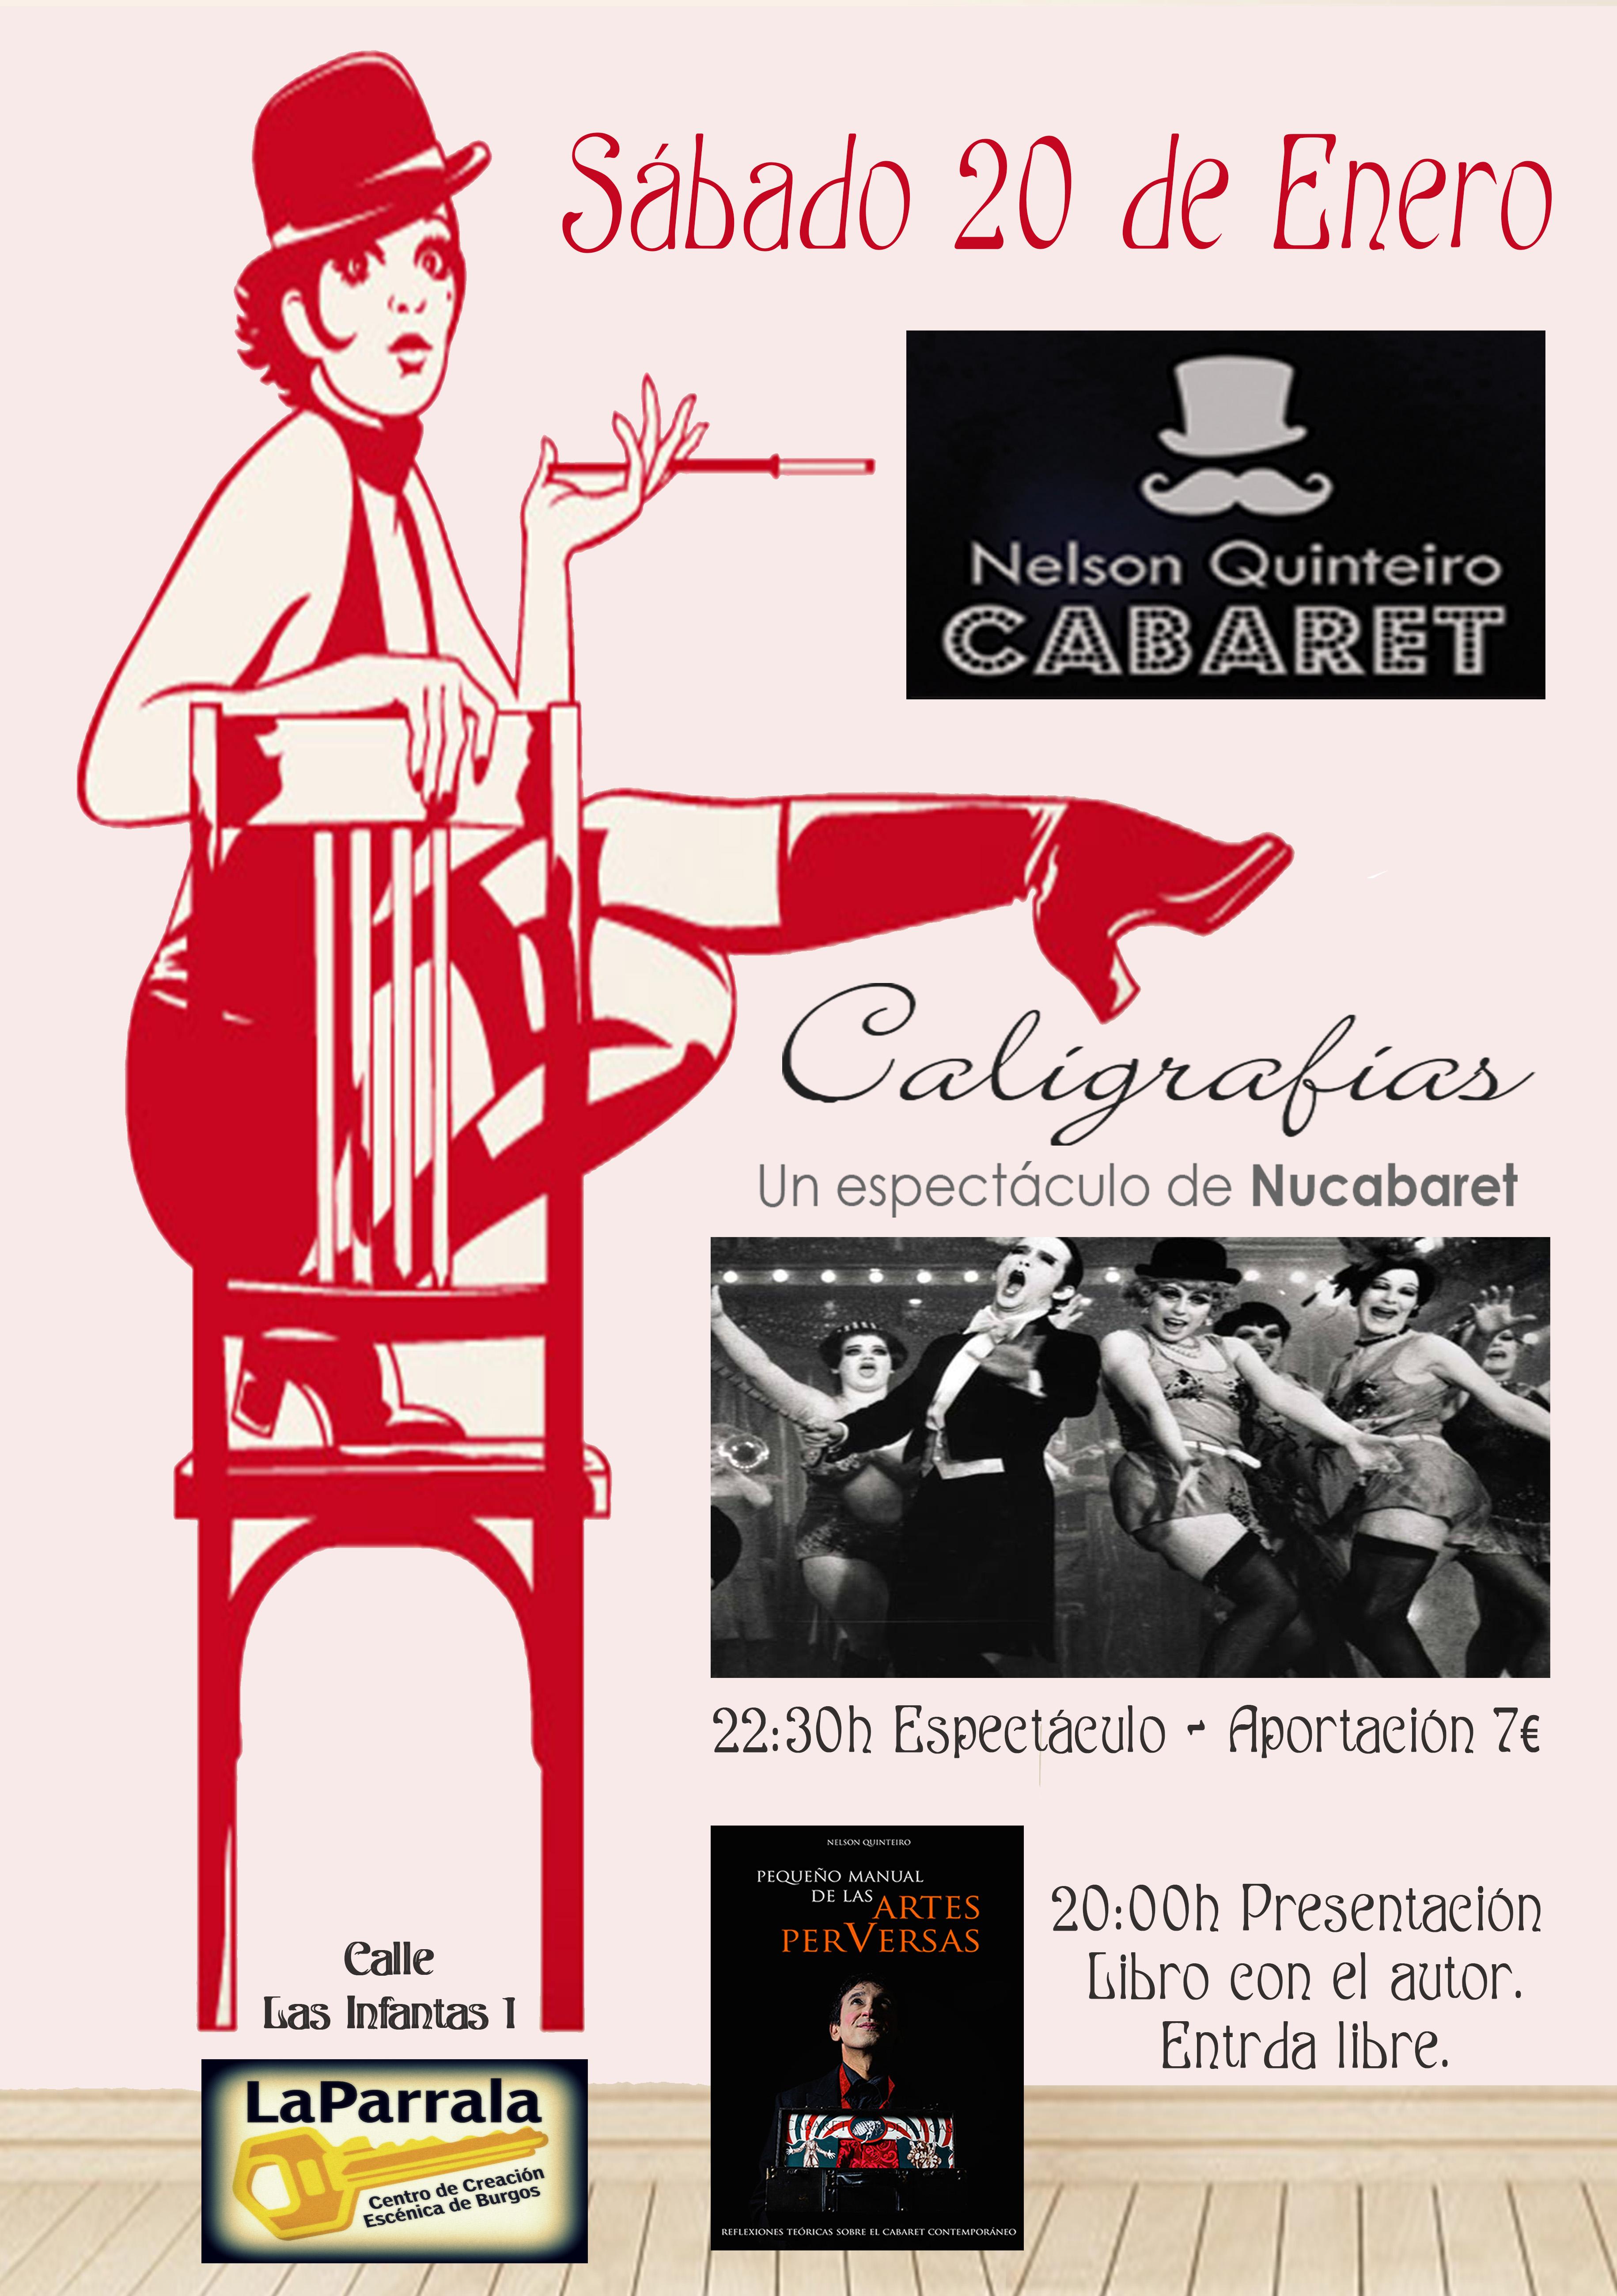 Noche Cabaret 20 de Enero La Parrala